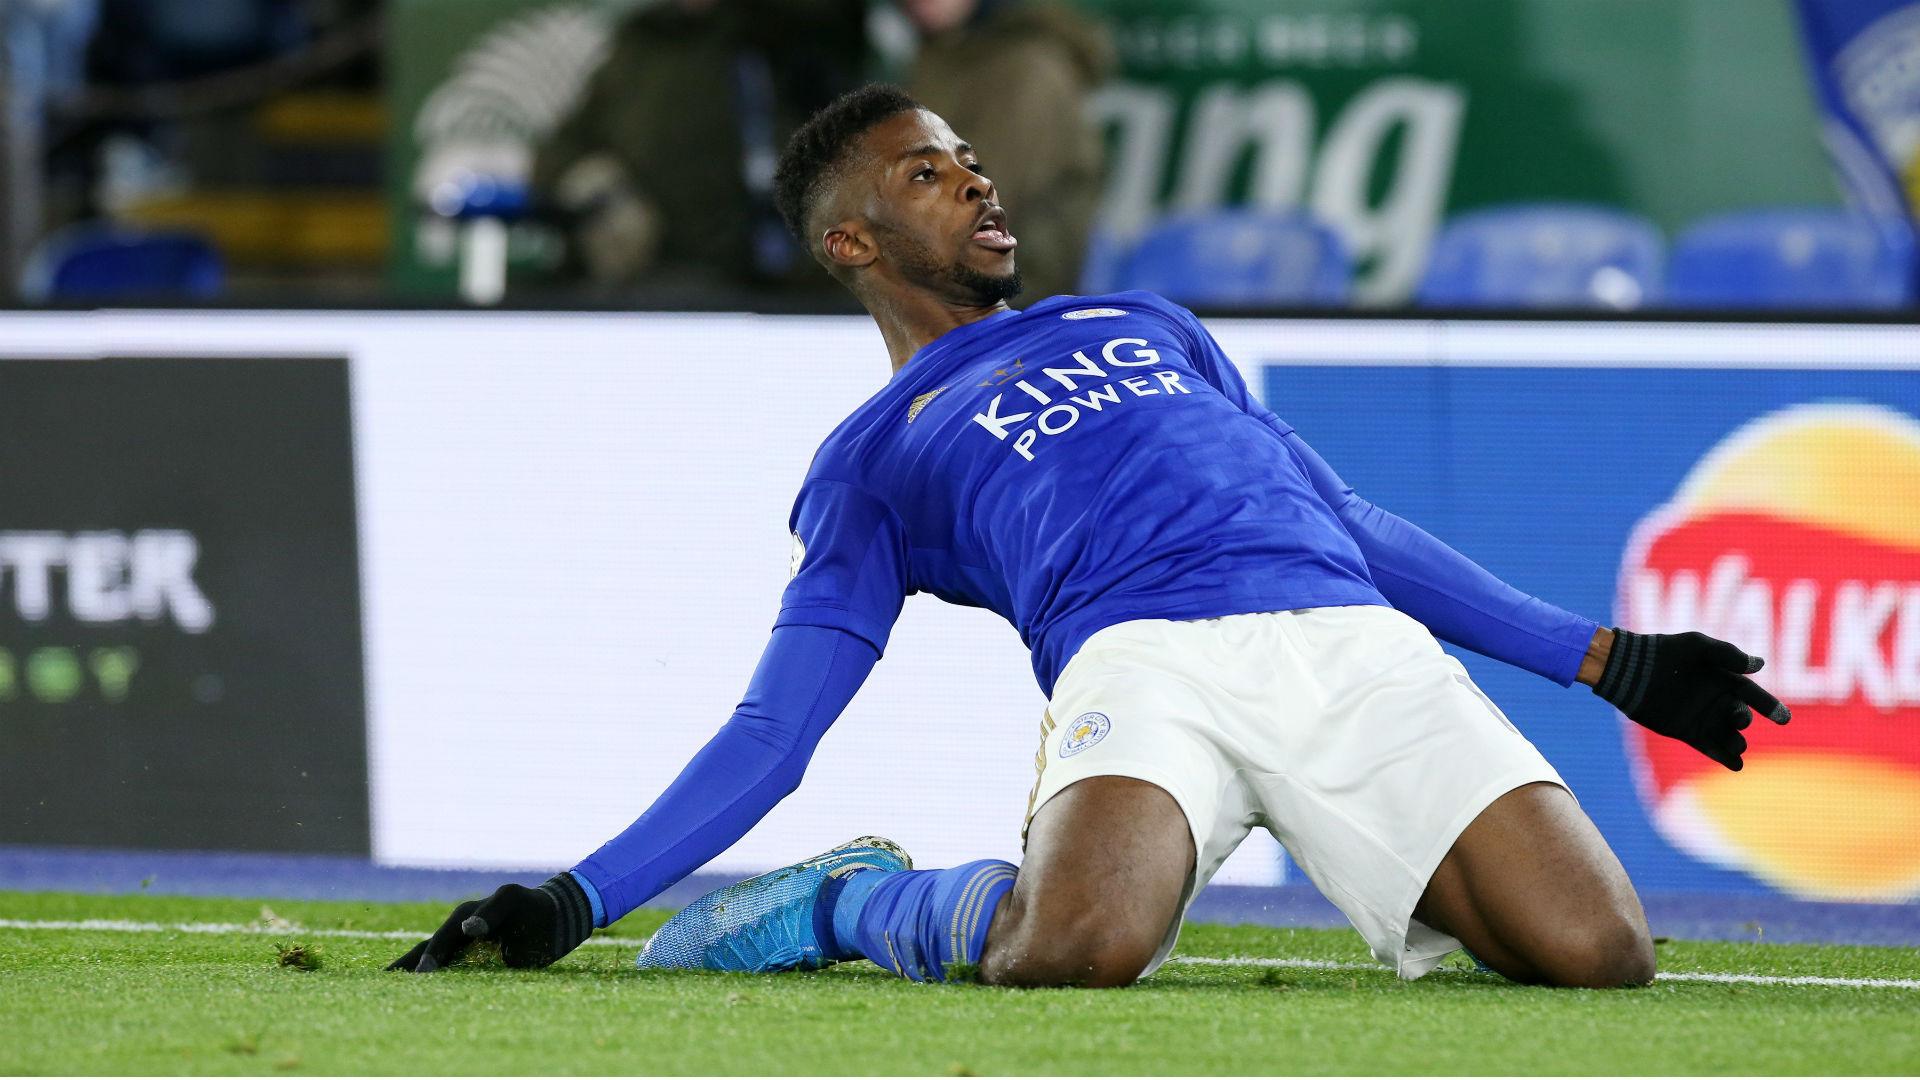 Watch Iheanacho fire Leicester City past Brentford